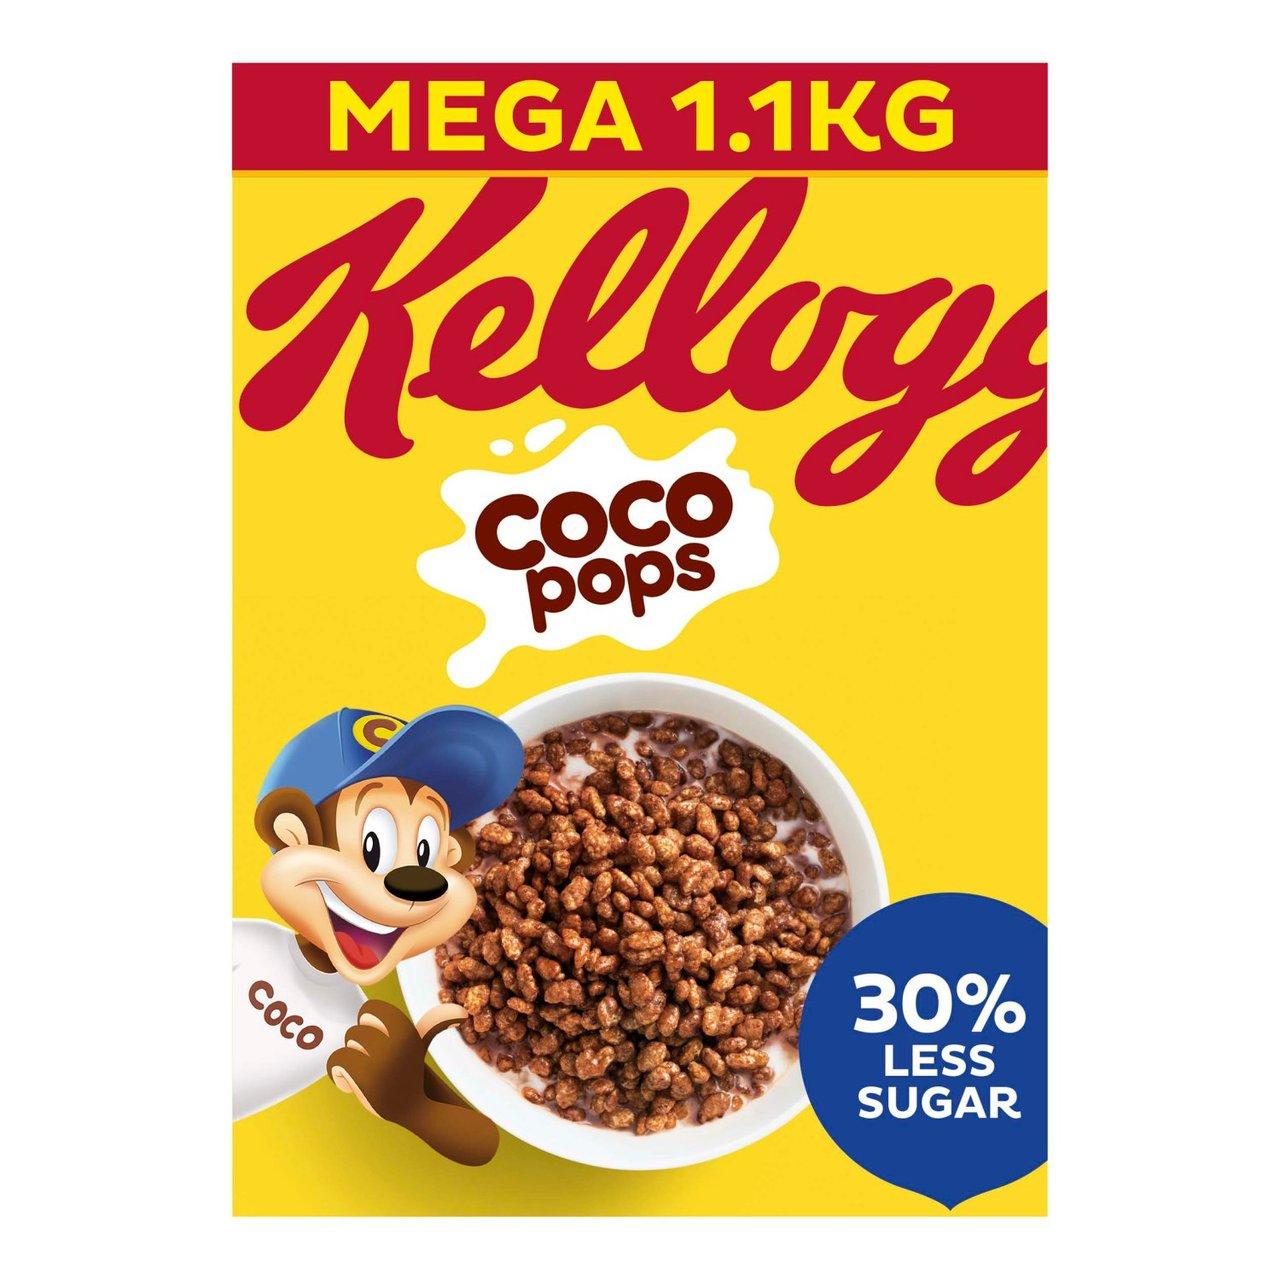 Kelloggs Coco Pops - Mega Pack 1.1kg £2.00 @ Asda Washington